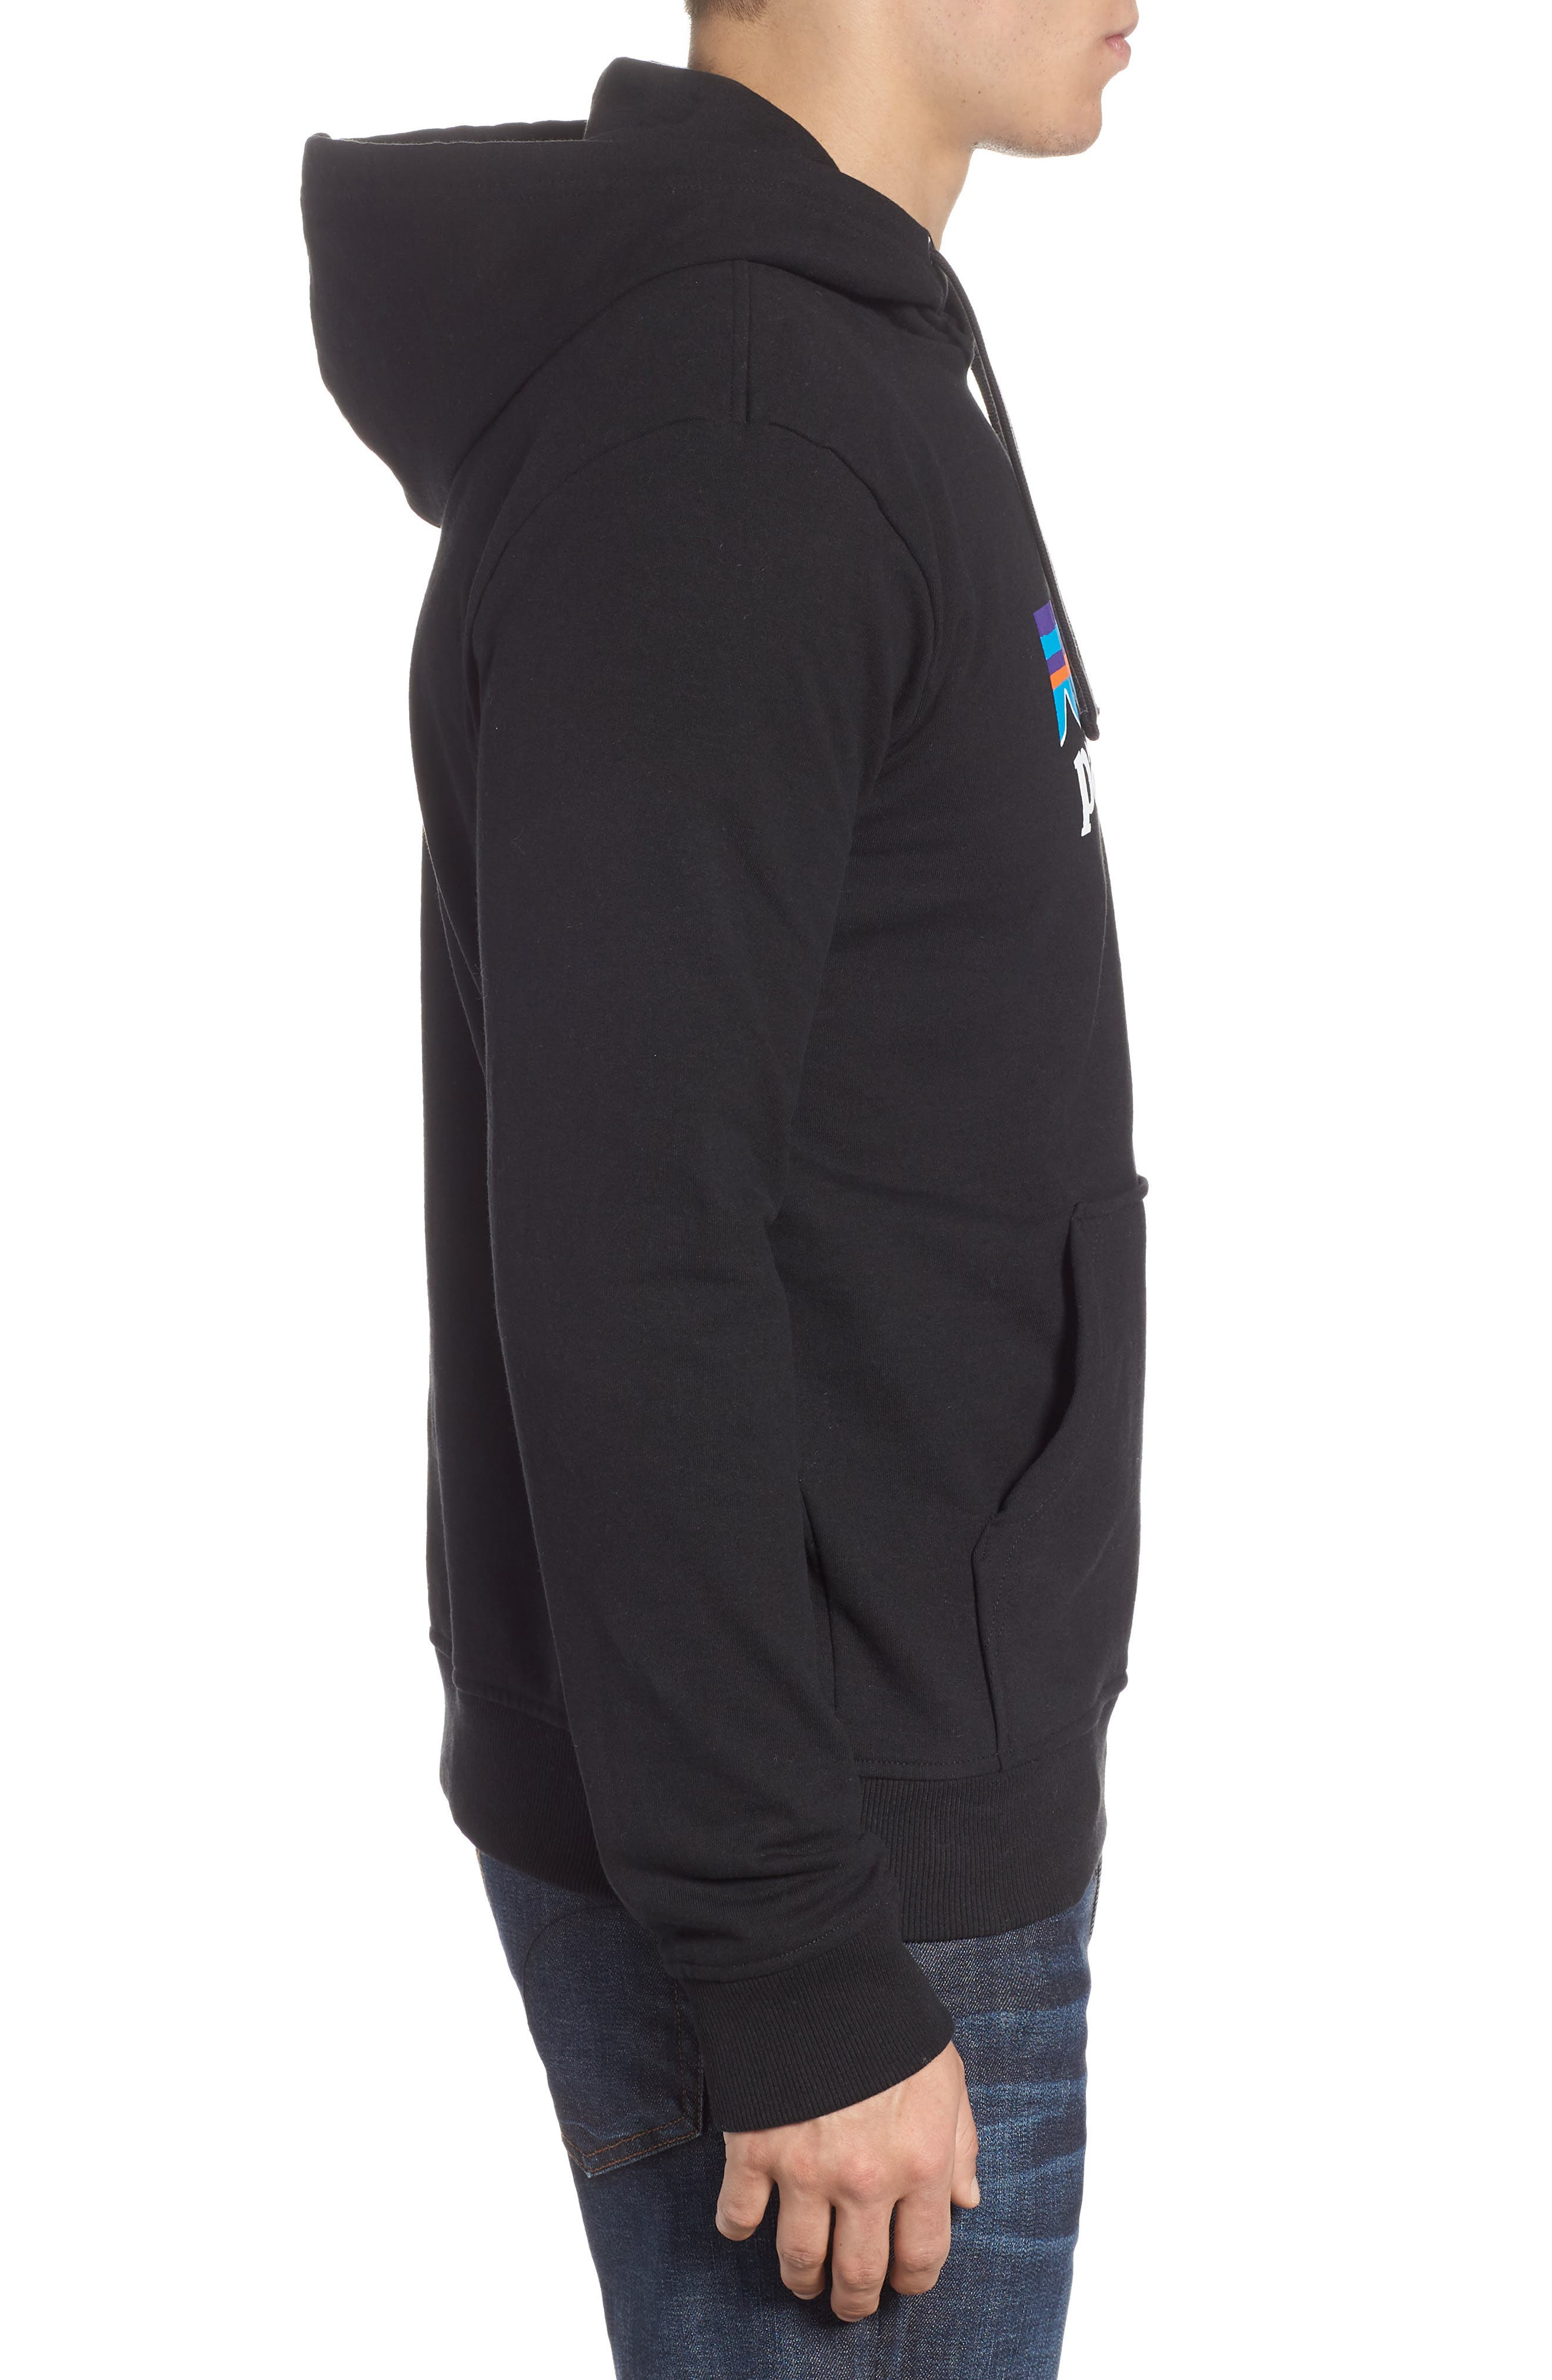 PATAGONIA, P6 Logo Uprisal Hooded Sweatshirt, Alternate thumbnail 3, color, BLACK